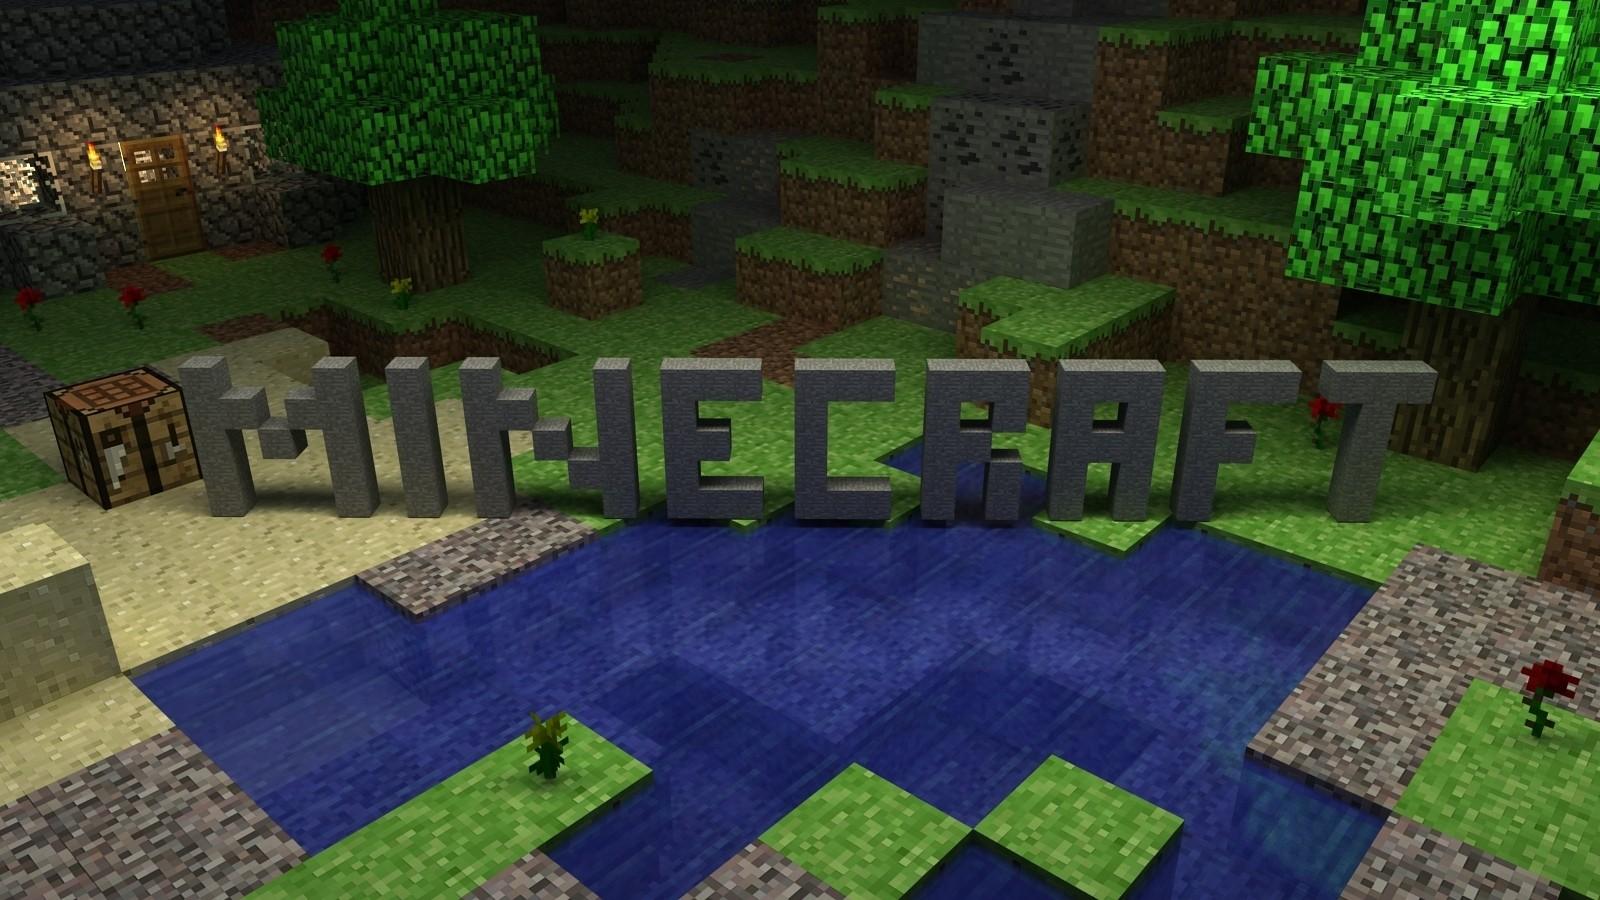 Minecraft Wallpapers HD Wallpaper 1600x900